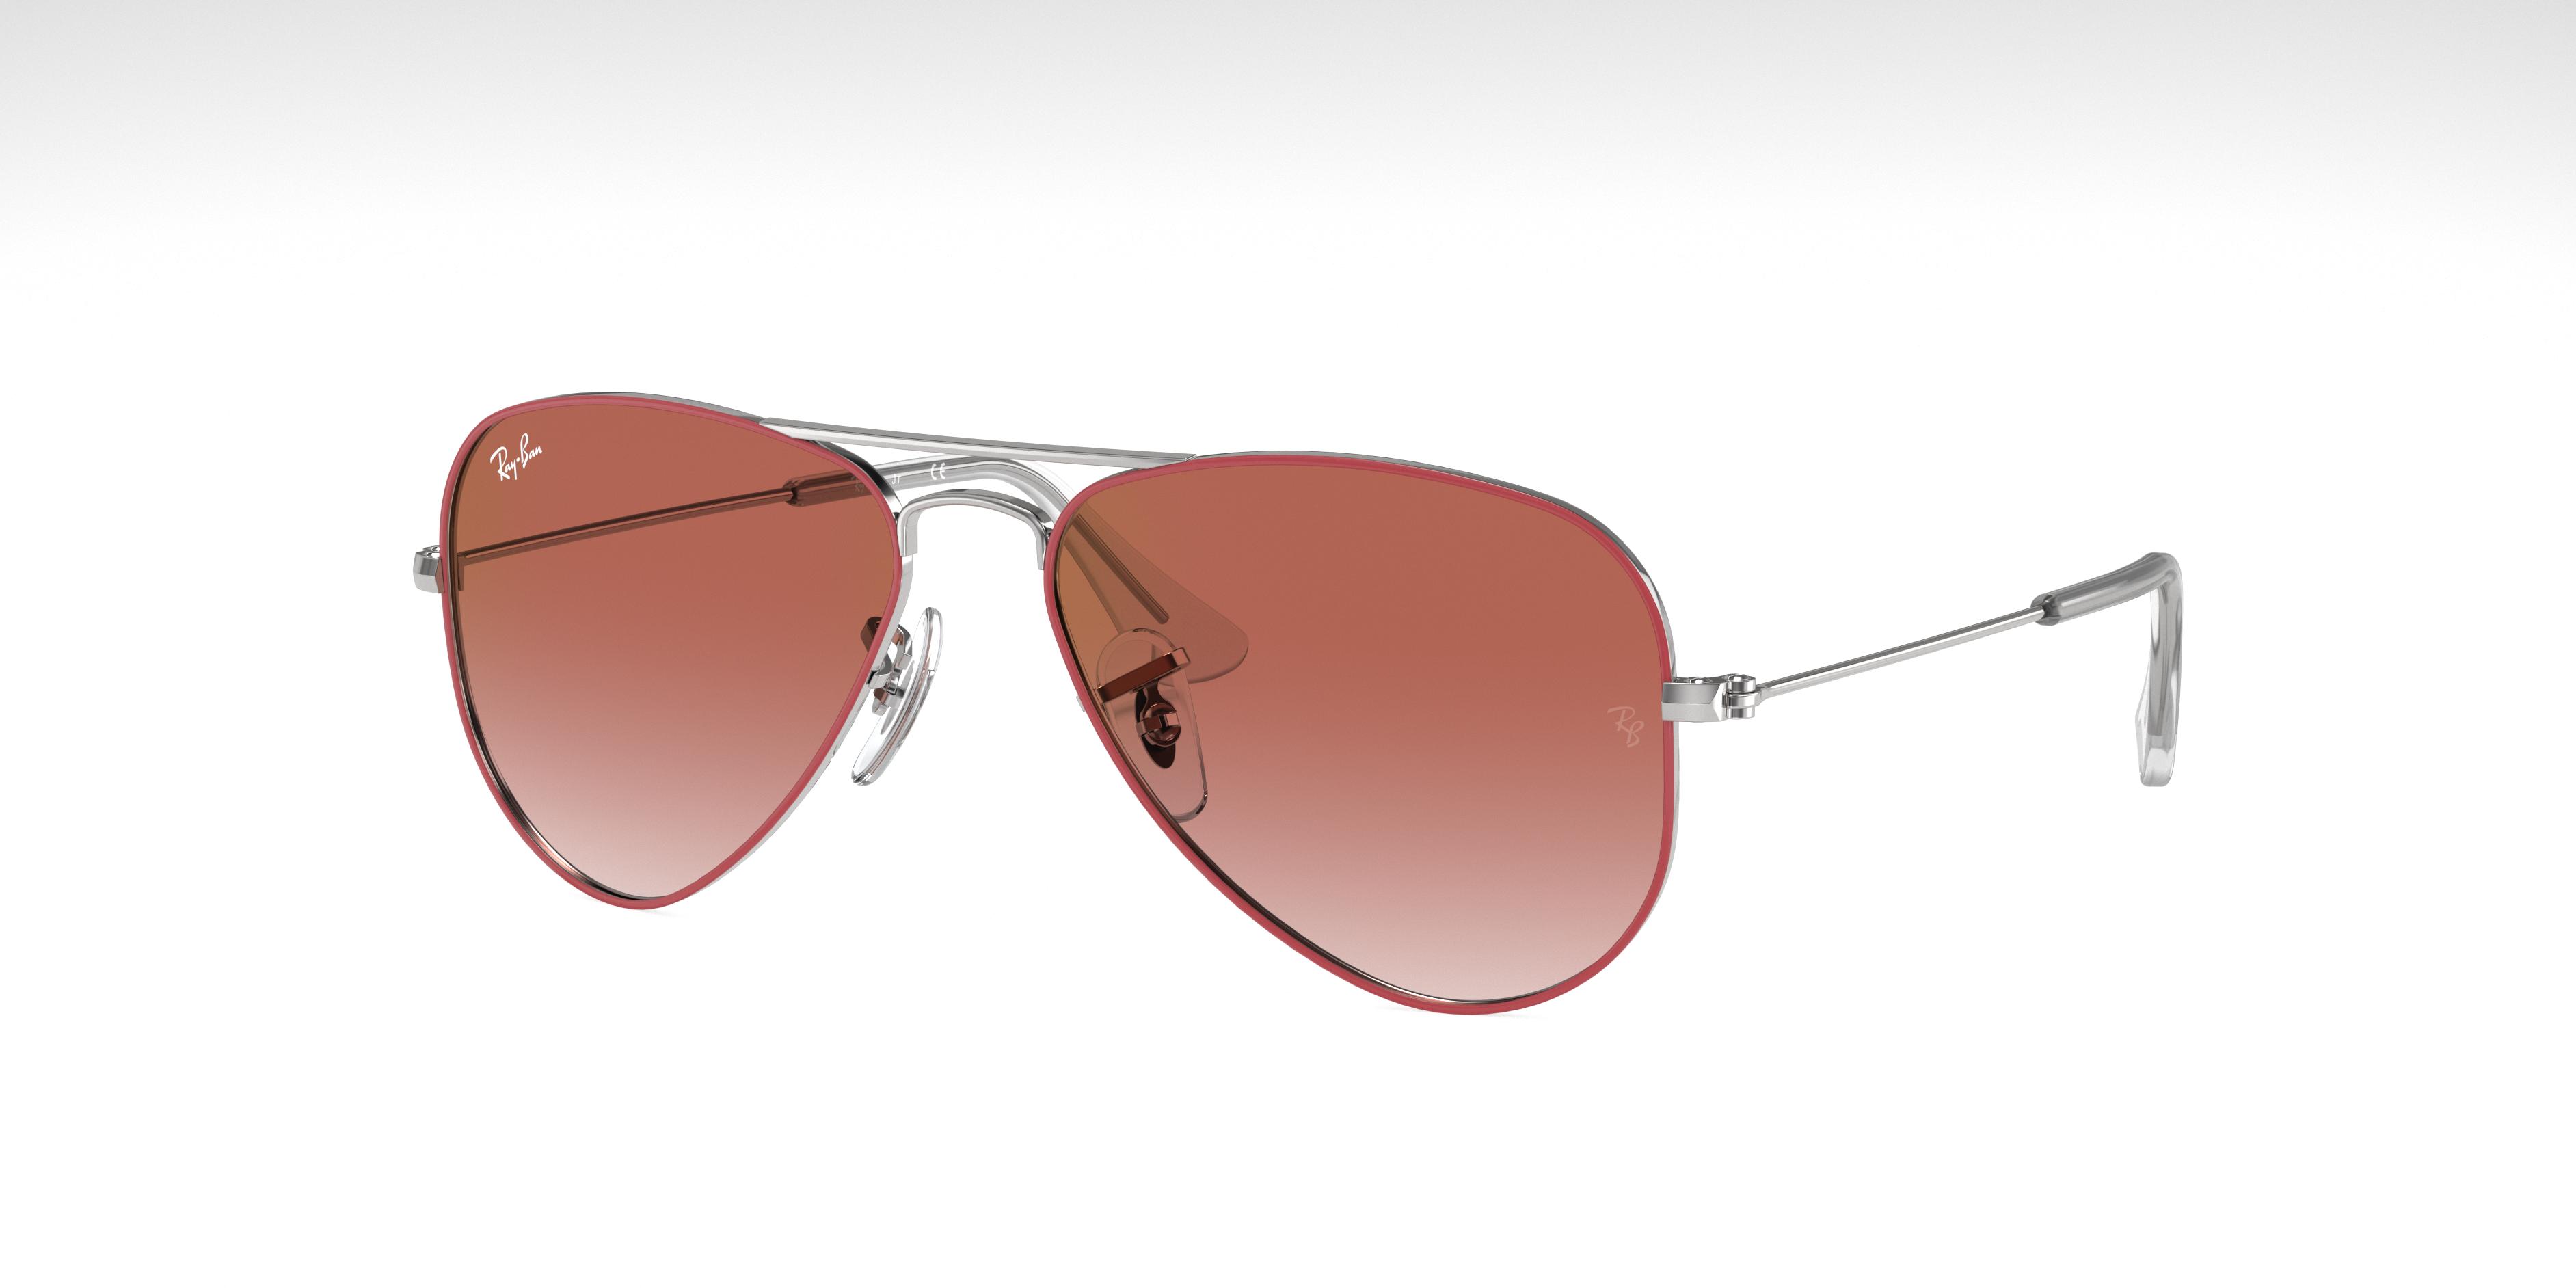 Ray-Ban Aviator Junior Silver, Red Lenses - RJ9506S